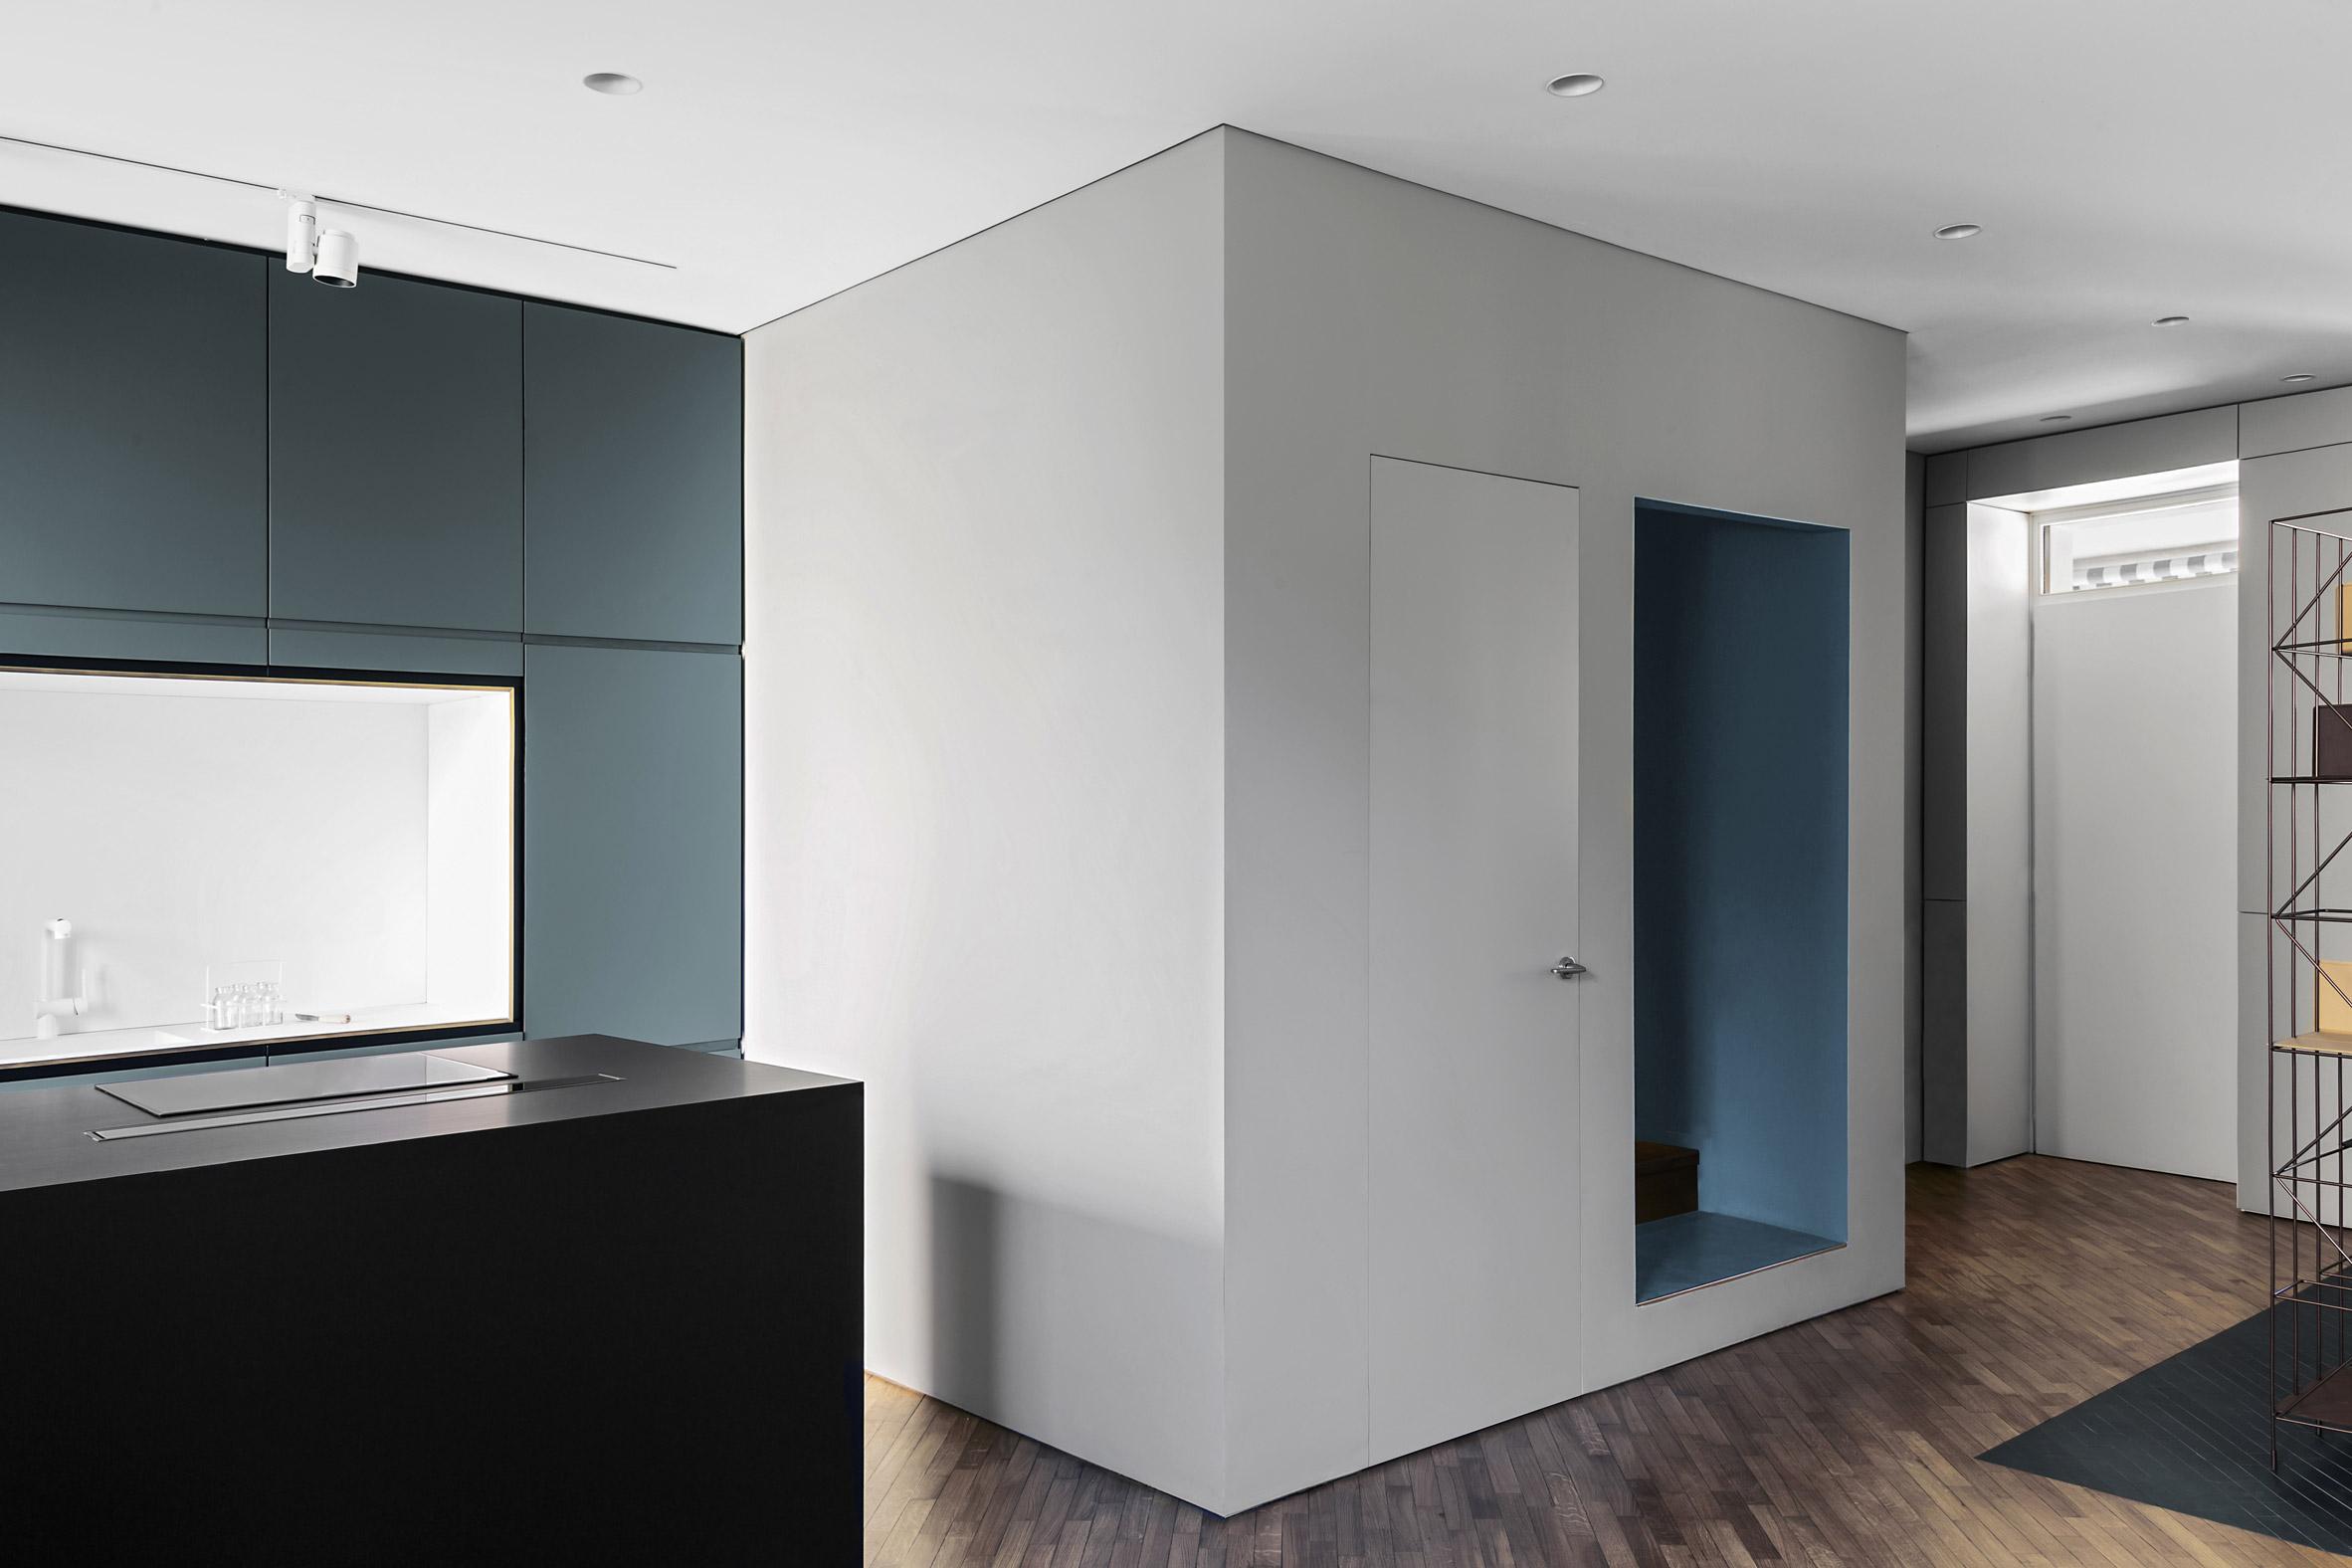 Keuken Wandkast 5 : Strakke moderne keuken met blauwe wandkast en zwart kookeiland